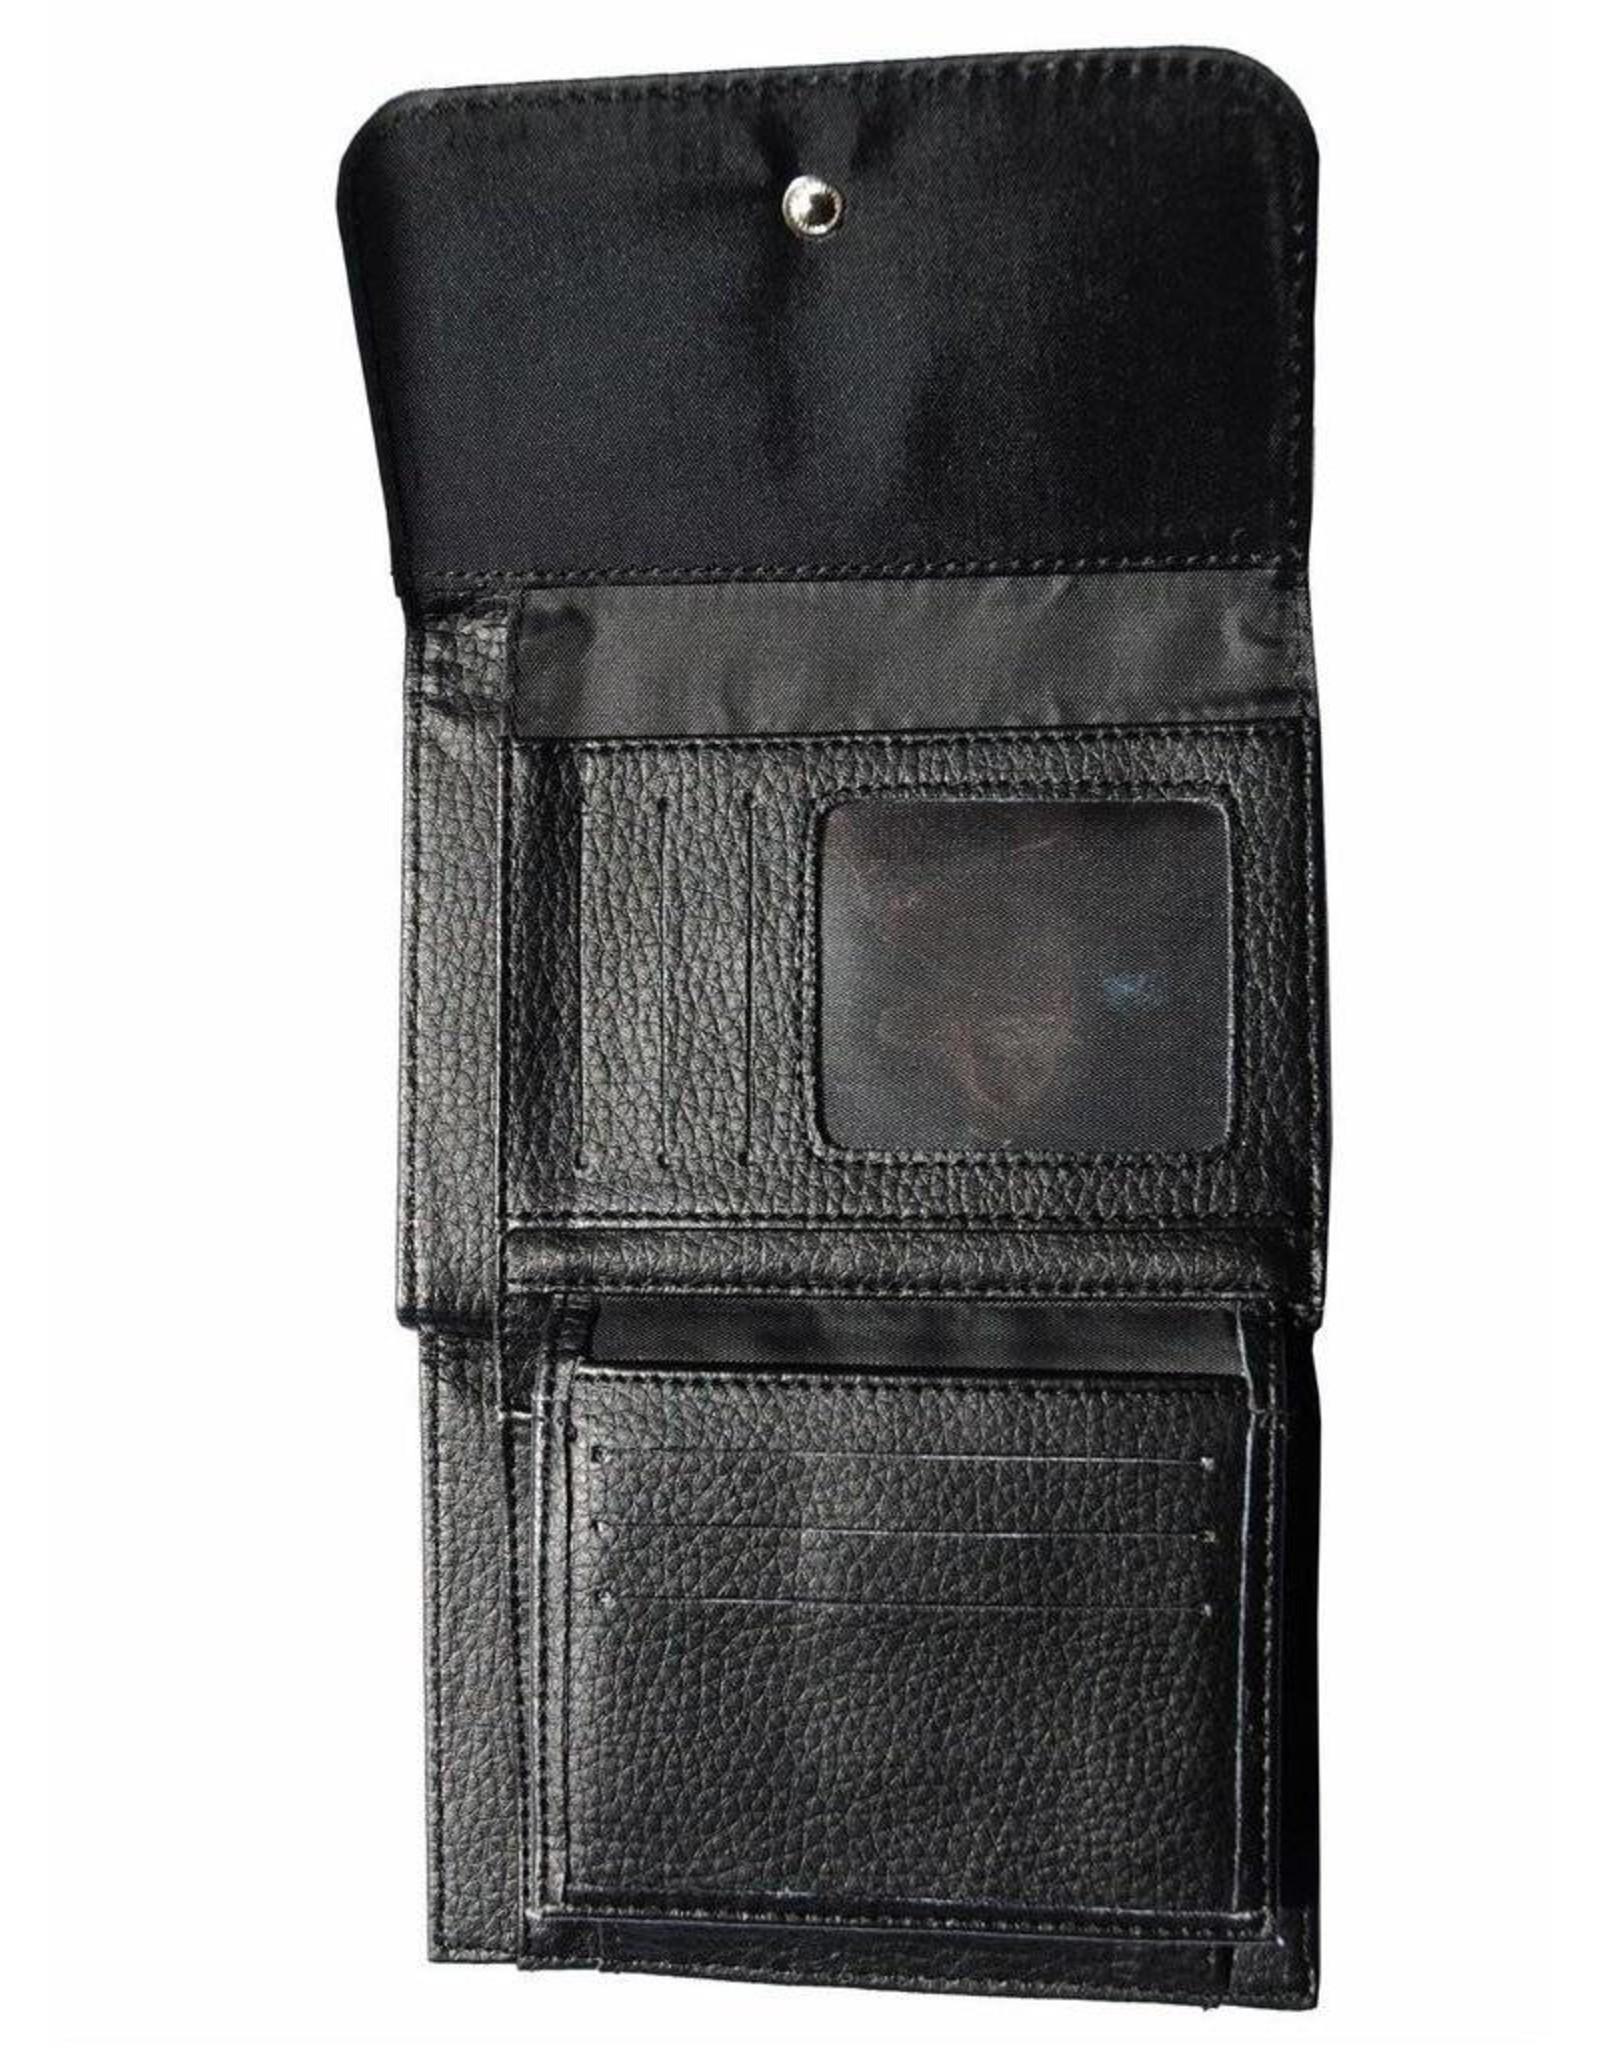 Darkside Wallets - Darkside Zombie Response Team Wallet